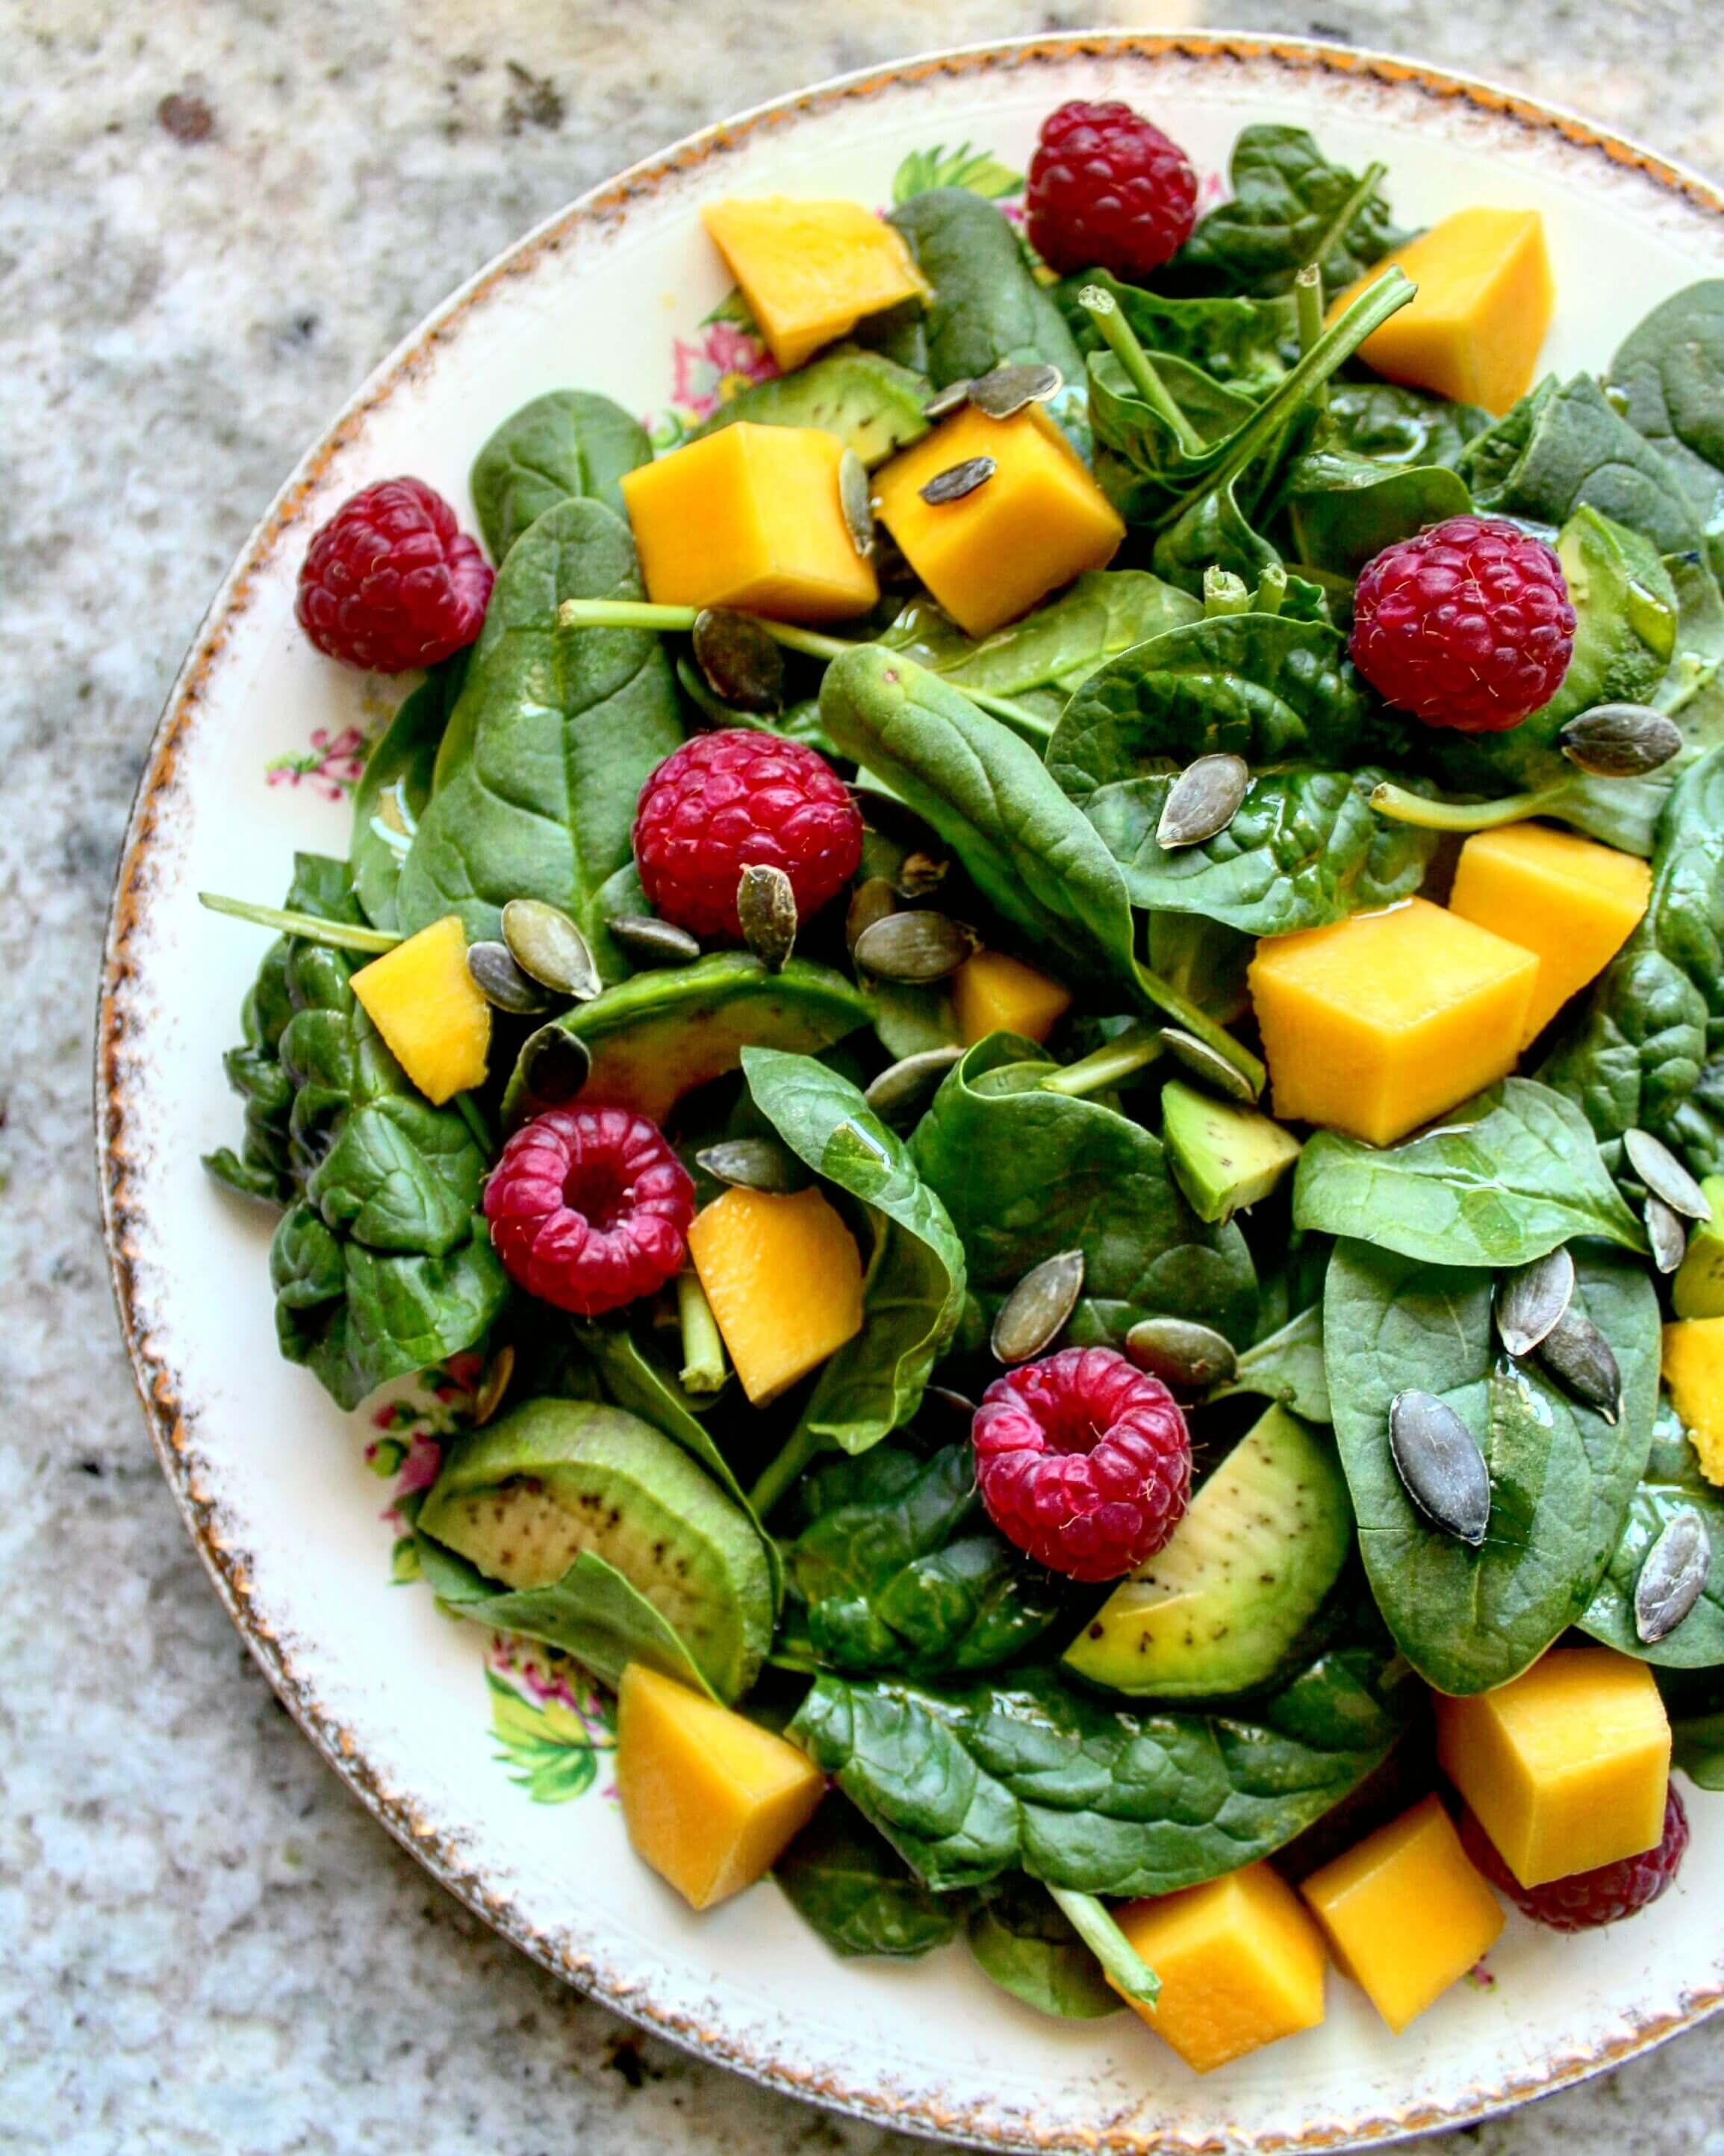 10 Raw Vegan Spinach Salad Recipes